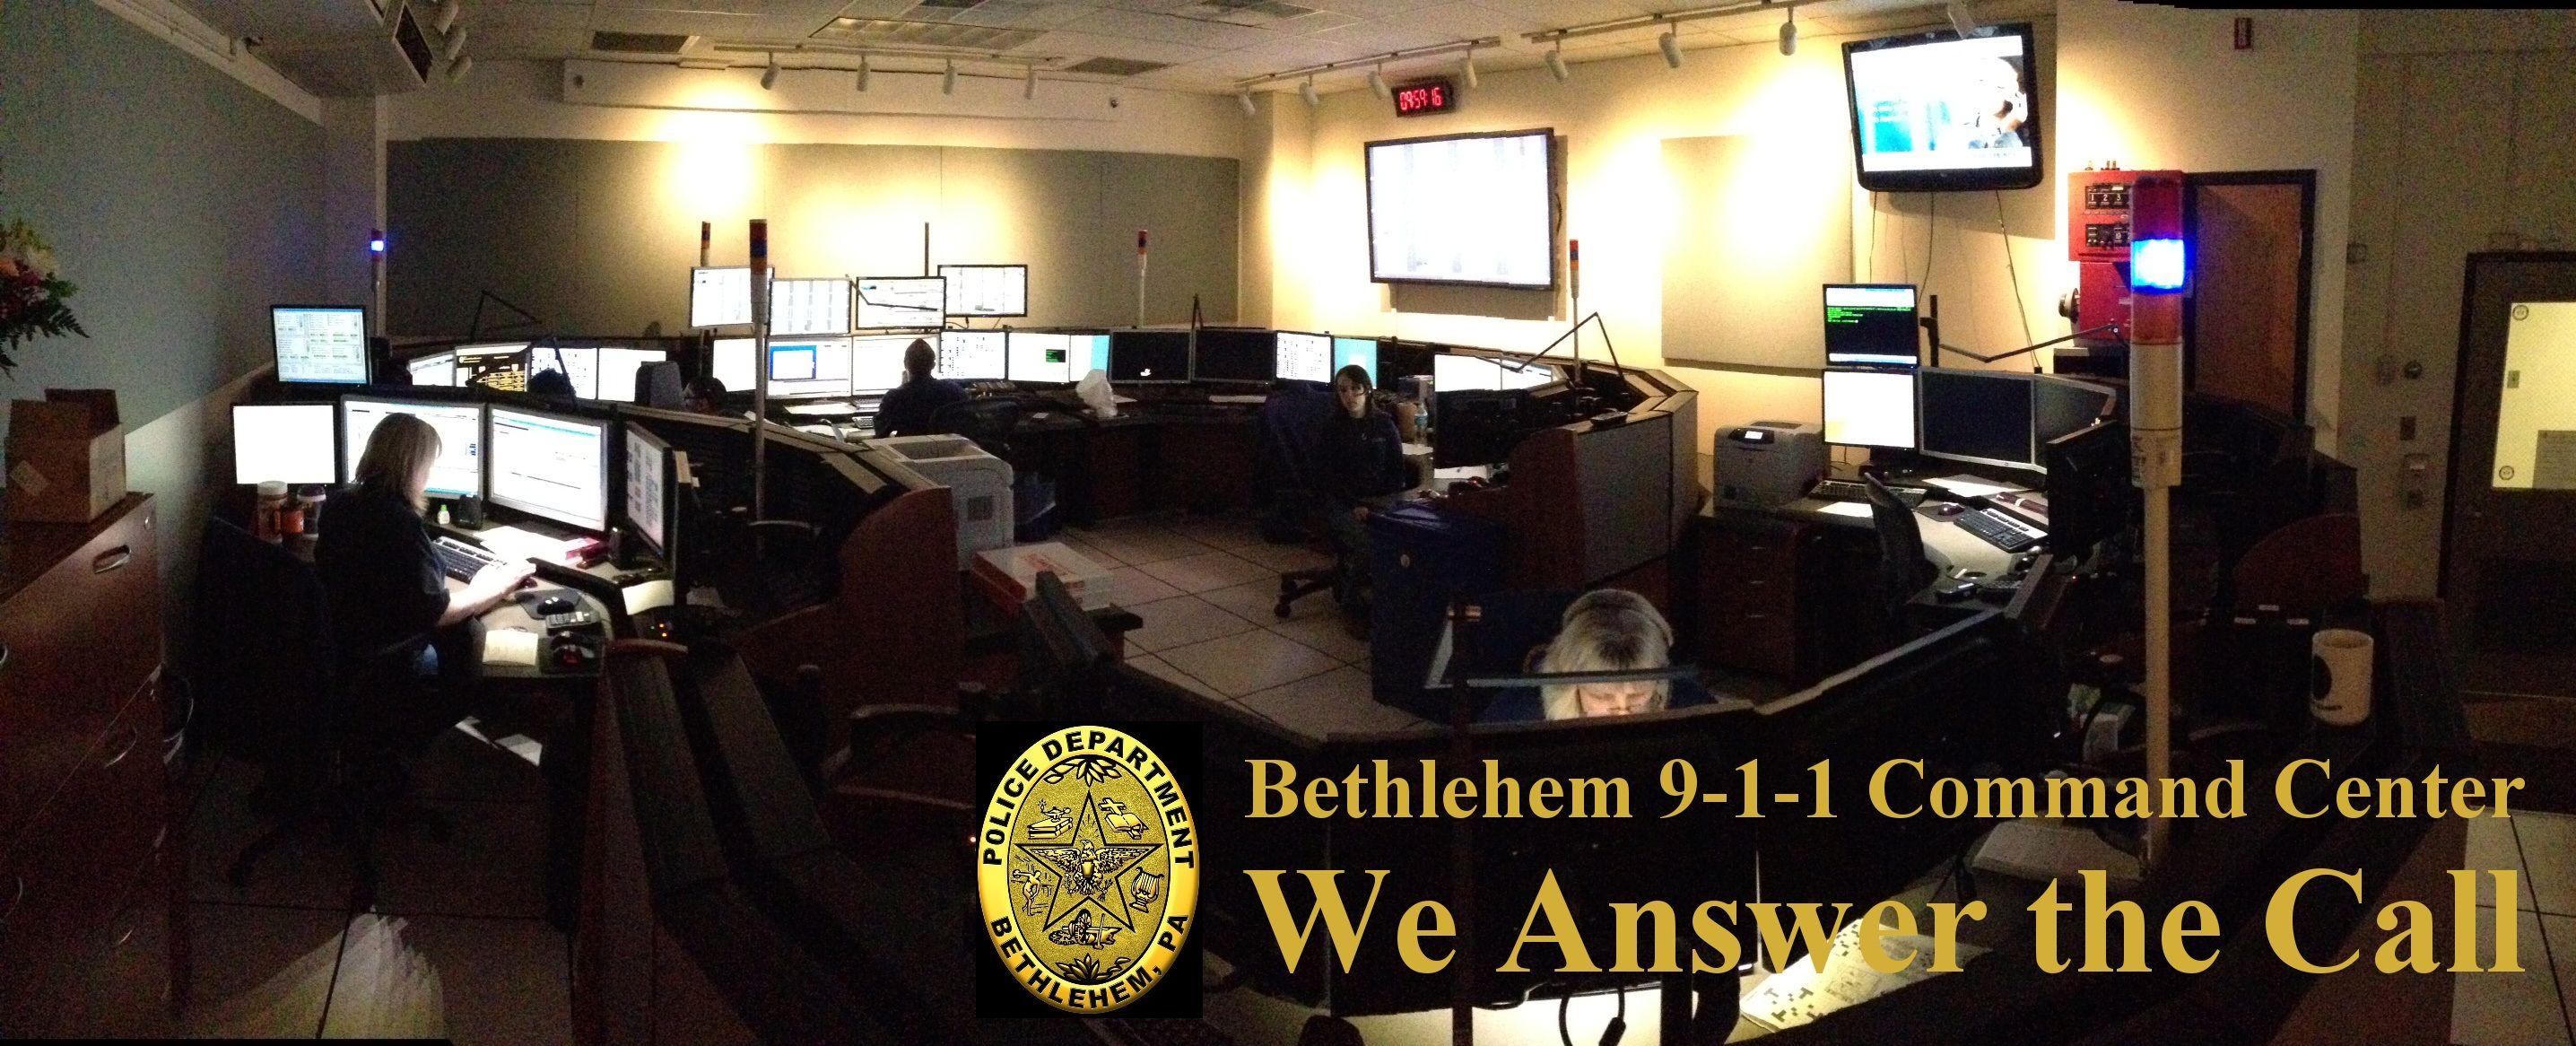 Thank you bethlehem 911 command center command center